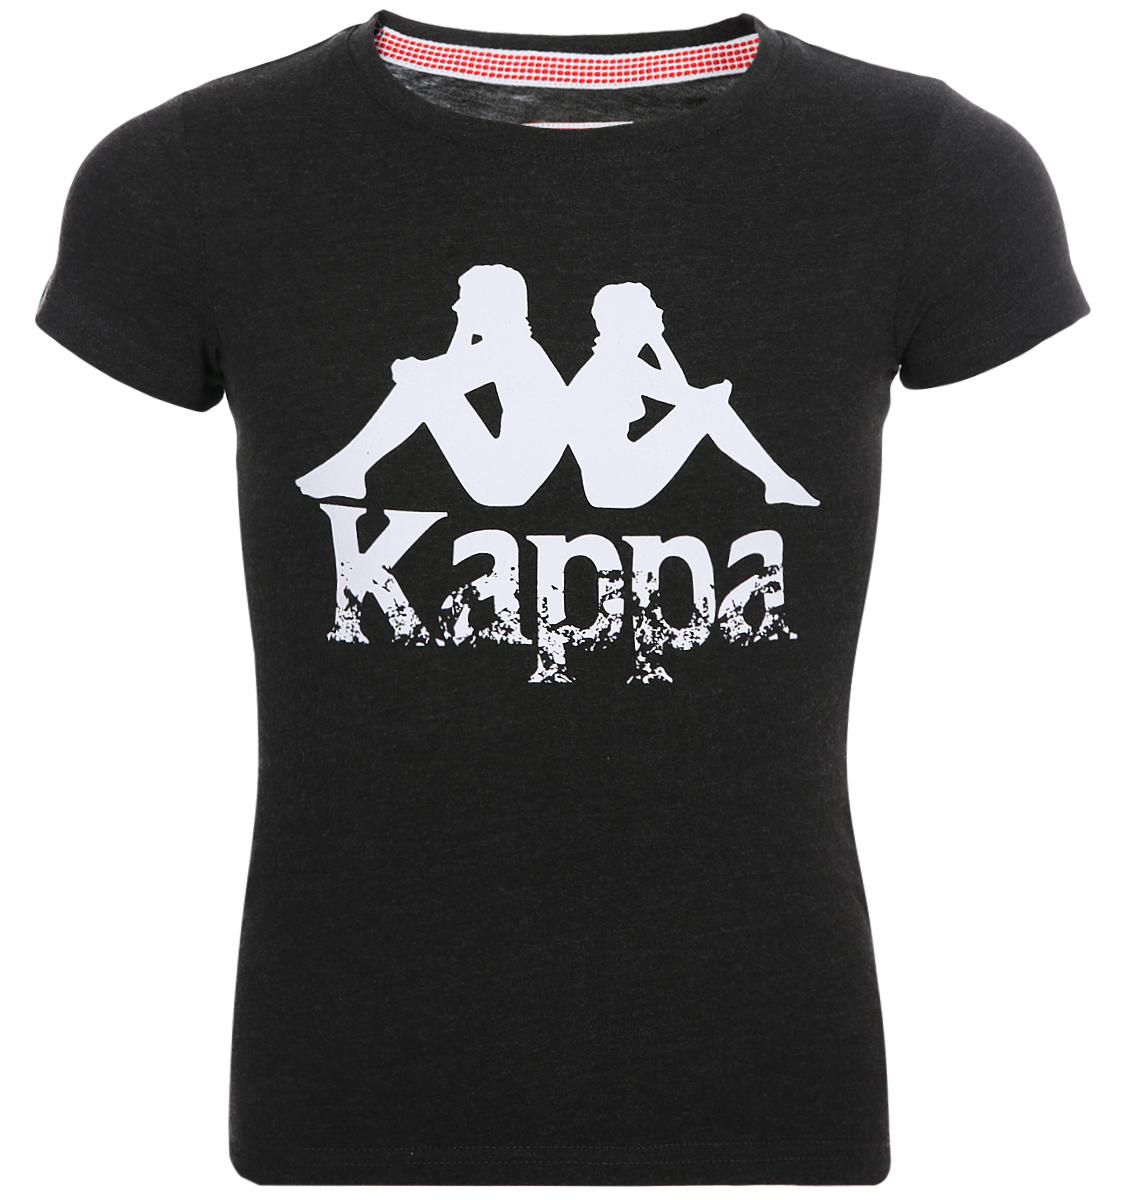 Футболка для девочки Kappa, цвет: темно-серый. 3032N90-4A. Размер 164